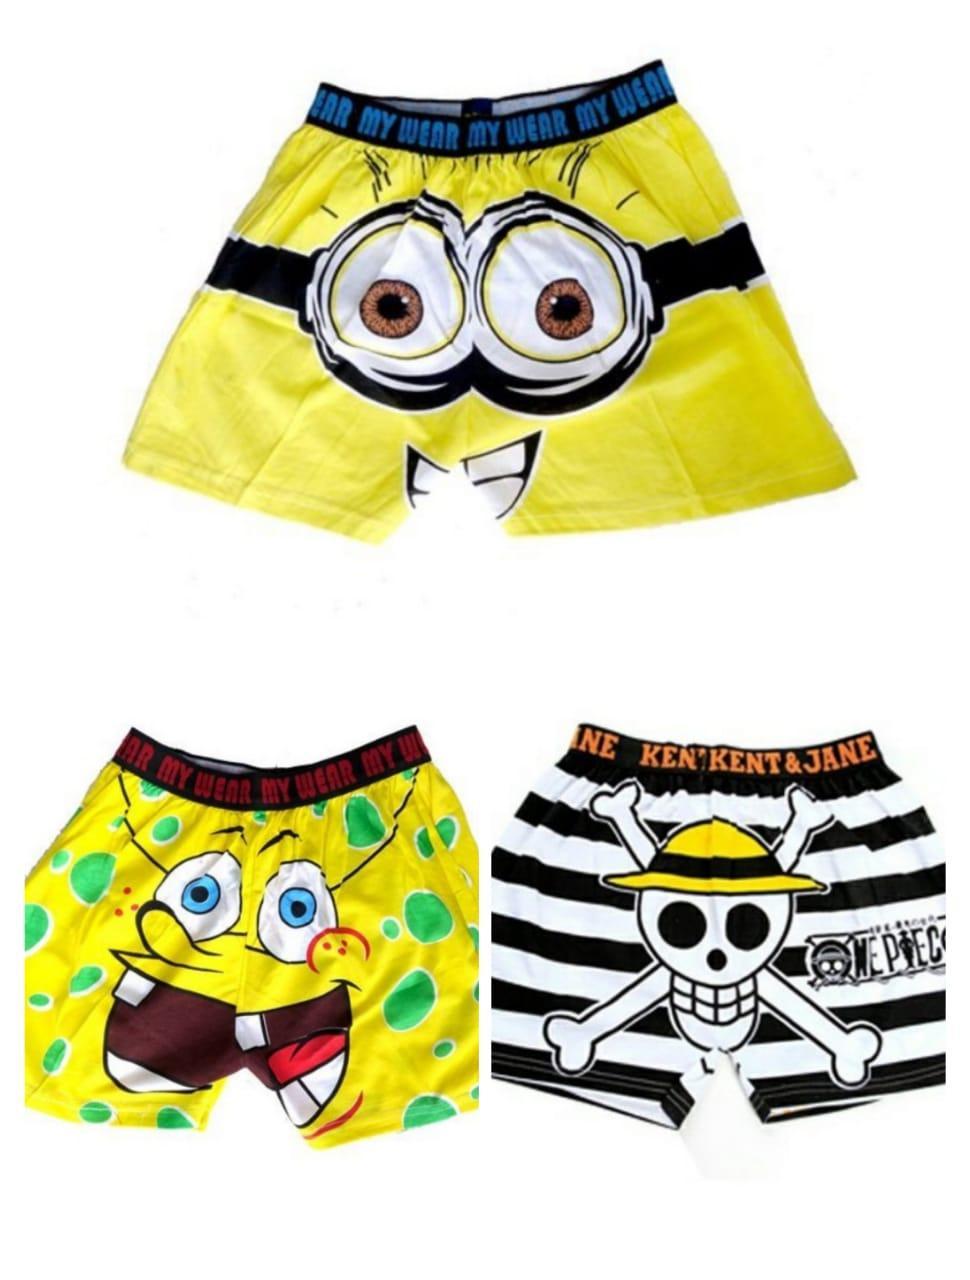 Pakaian Dalam Kaus Kaki Pria Celana Agree Original Isi 3 Pcs Pendek Boxer Hot Promo 3pcs Multiwarna